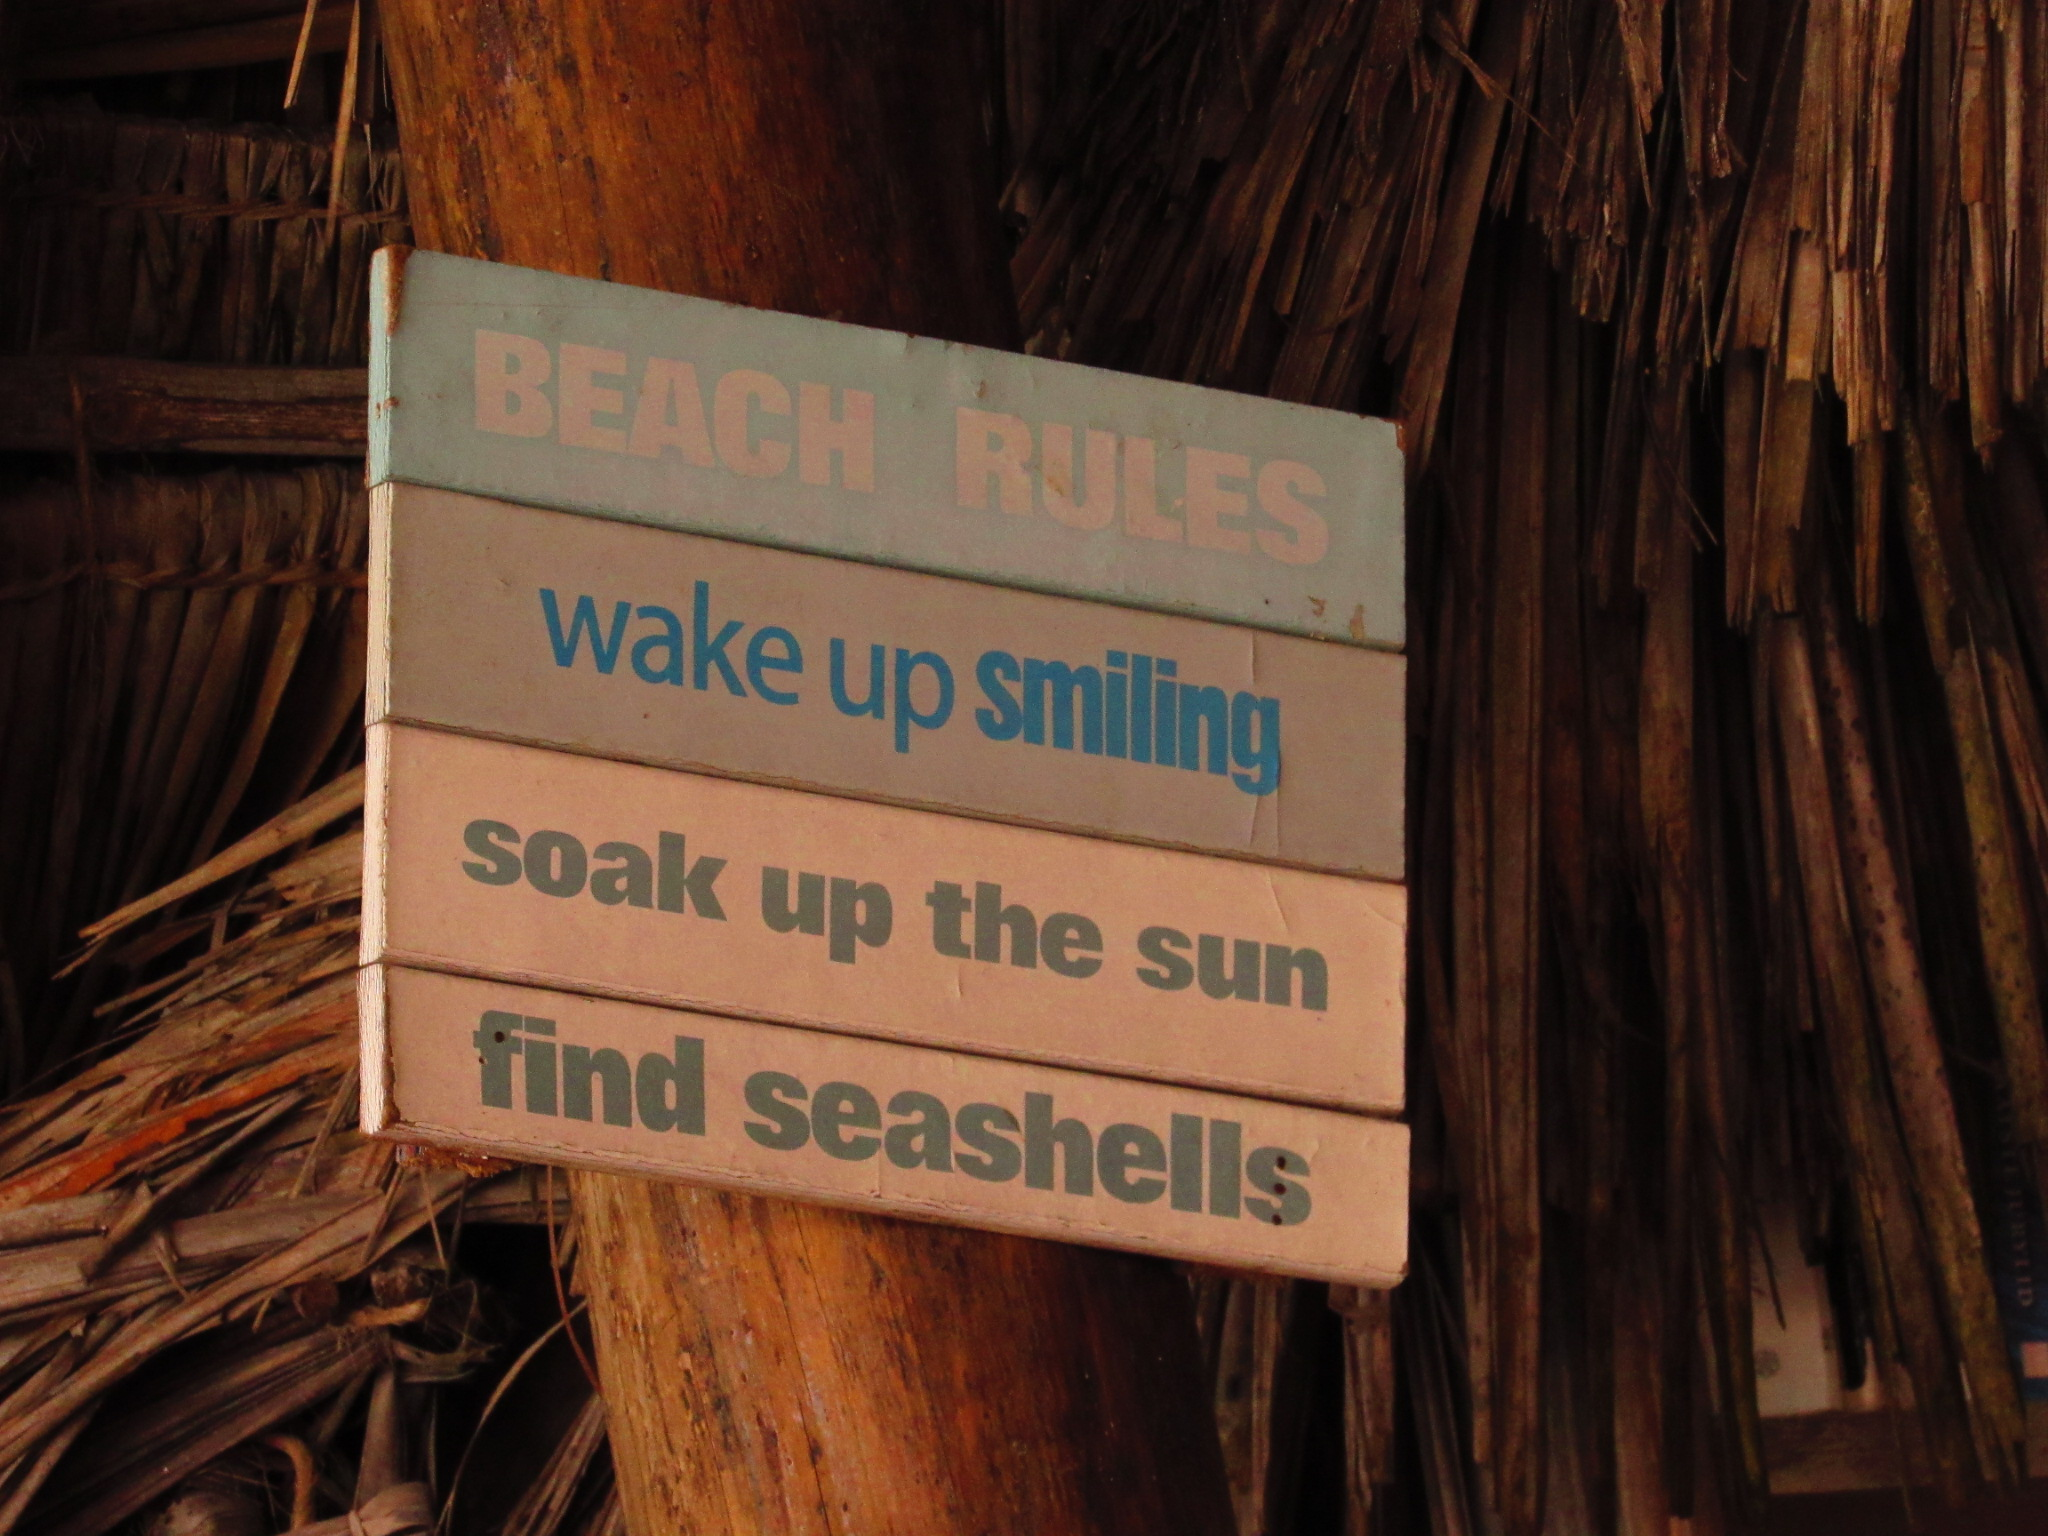 Beach rules: Wake up smiling; soak up the sun; find seashells